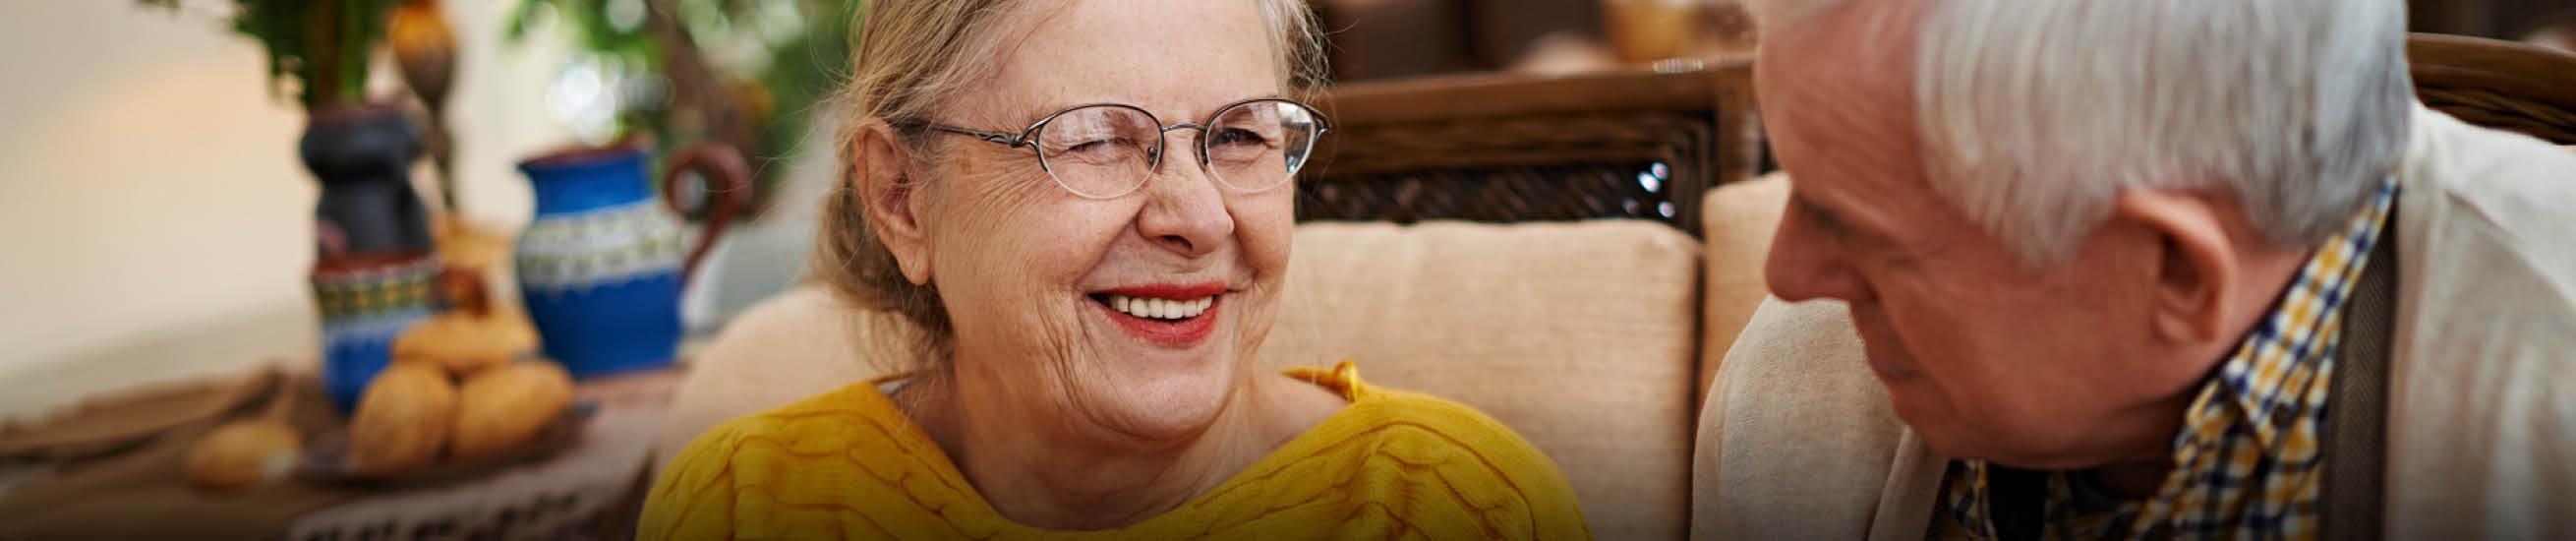 Older people smiling